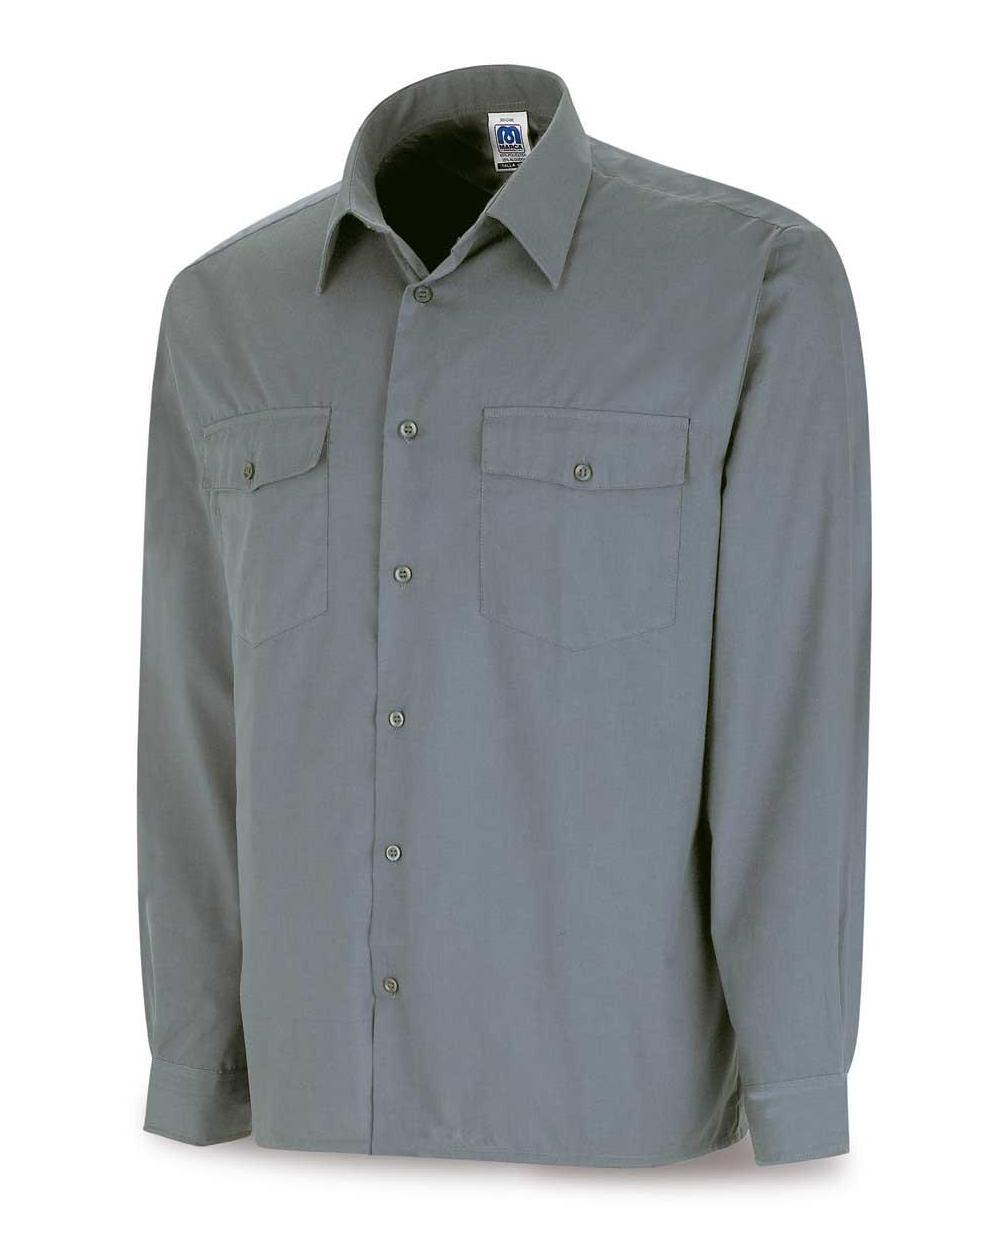 Comprar Camisa Tergal Gris M/Larga 388-Cgml barato